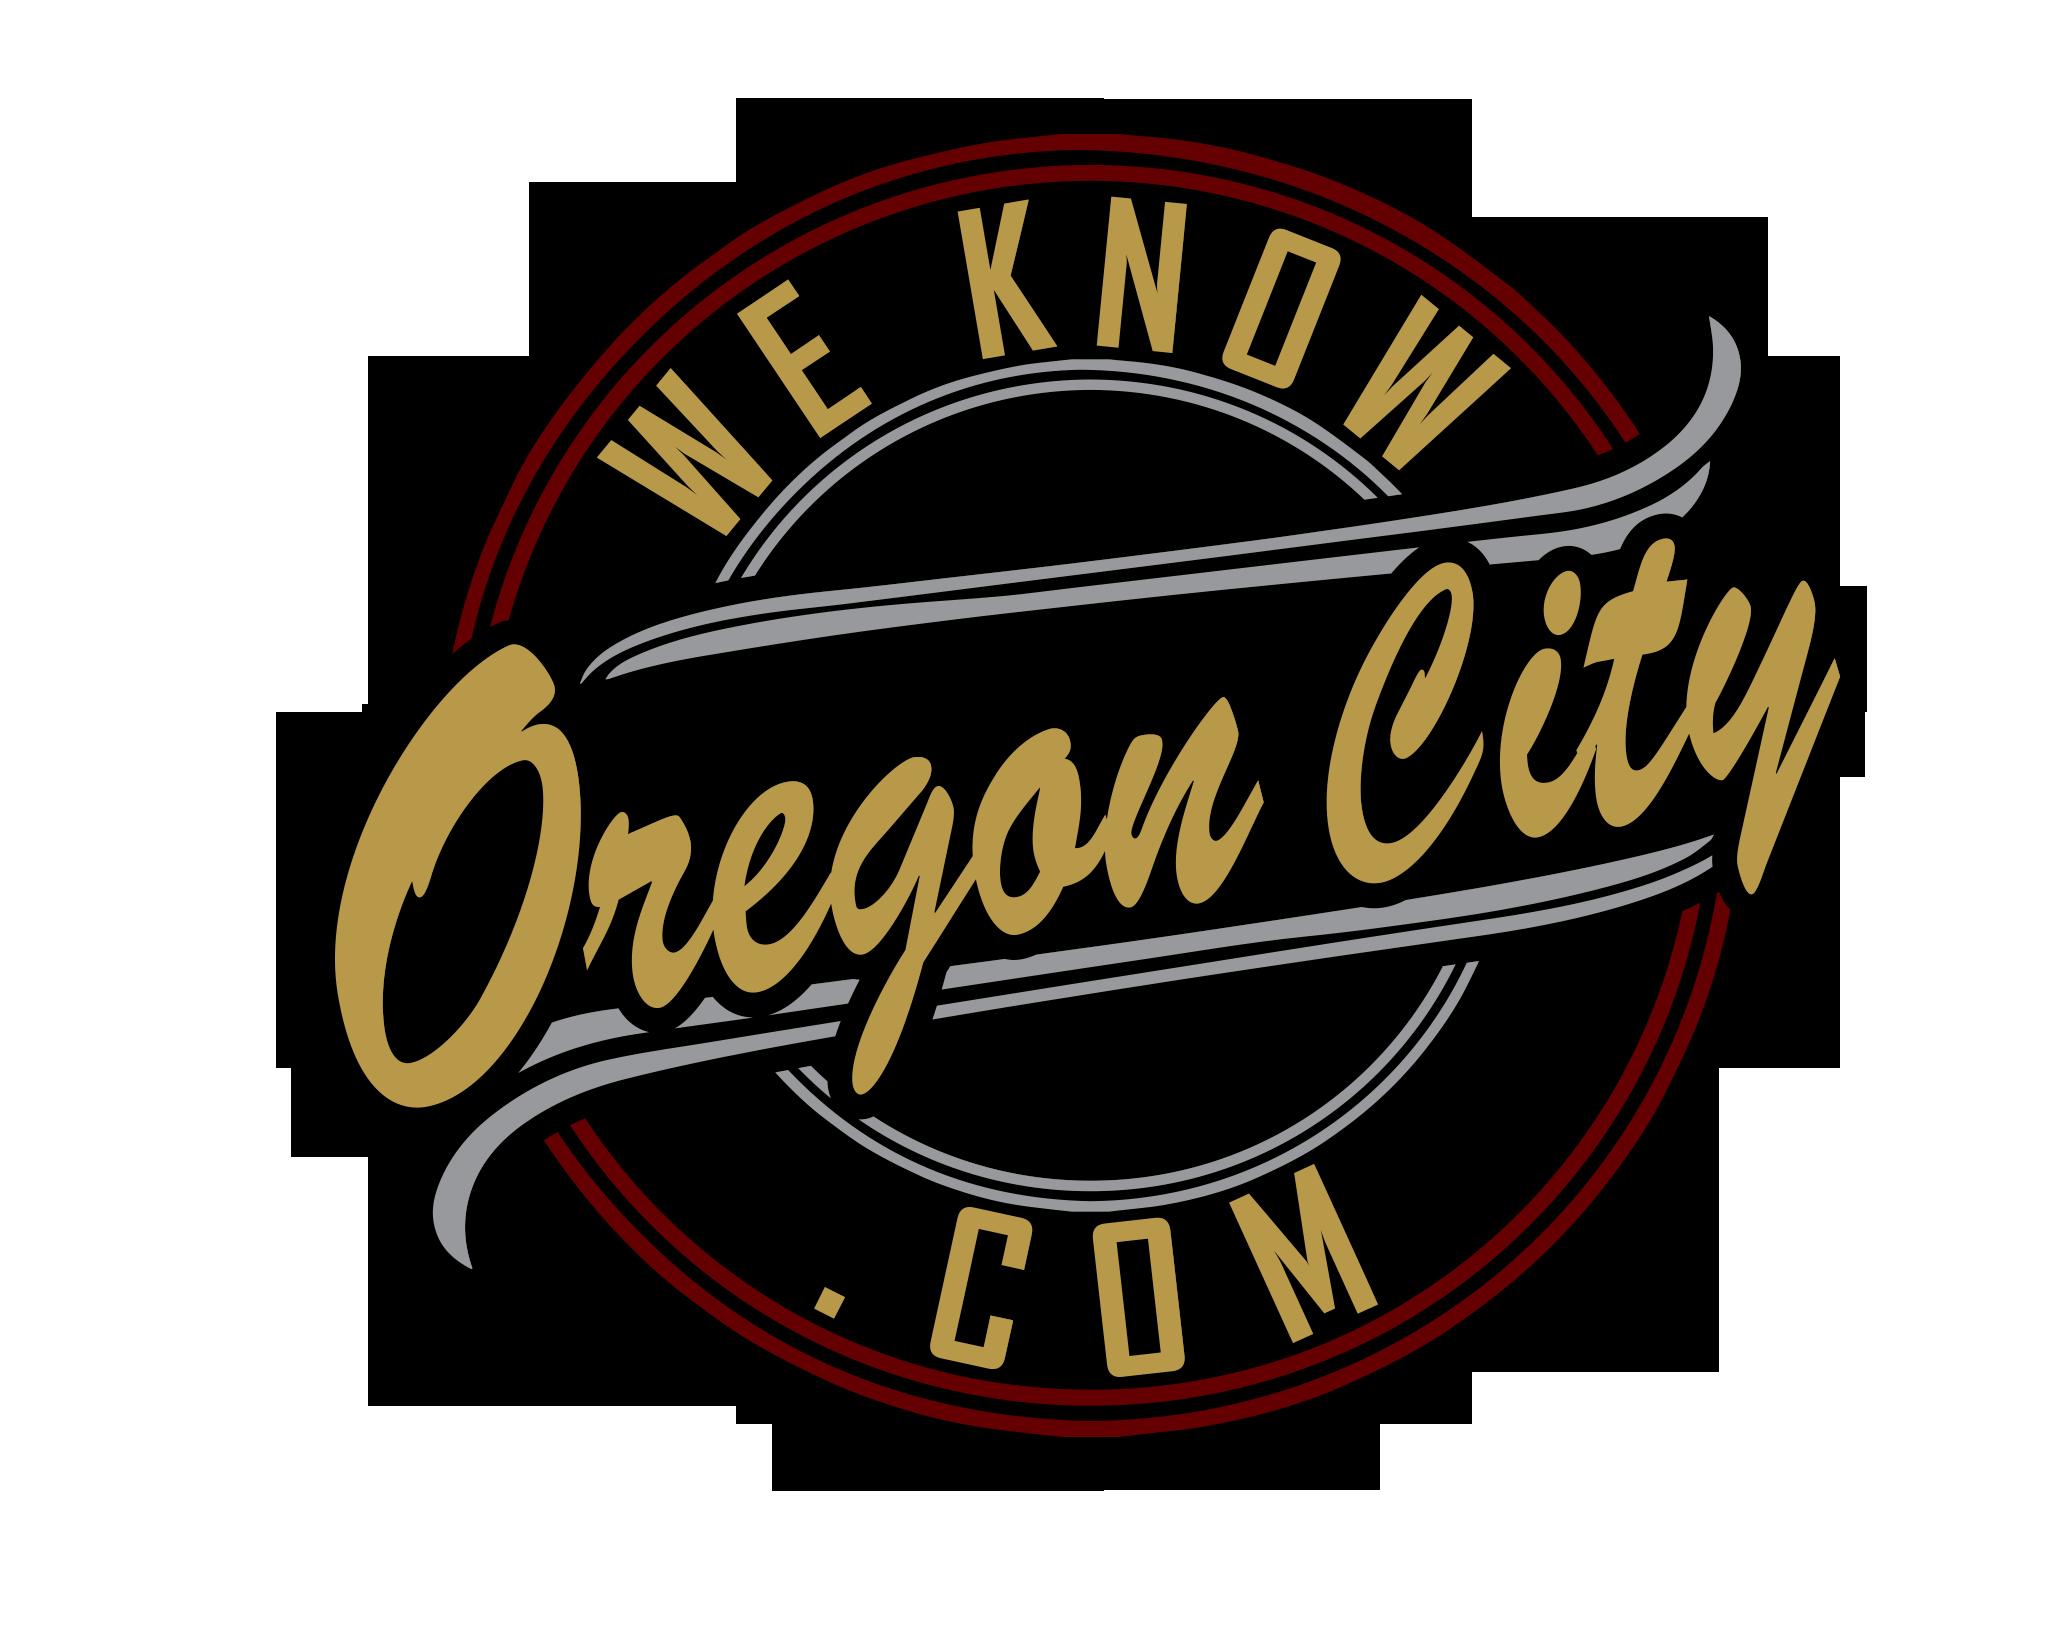 We Know Oregon City